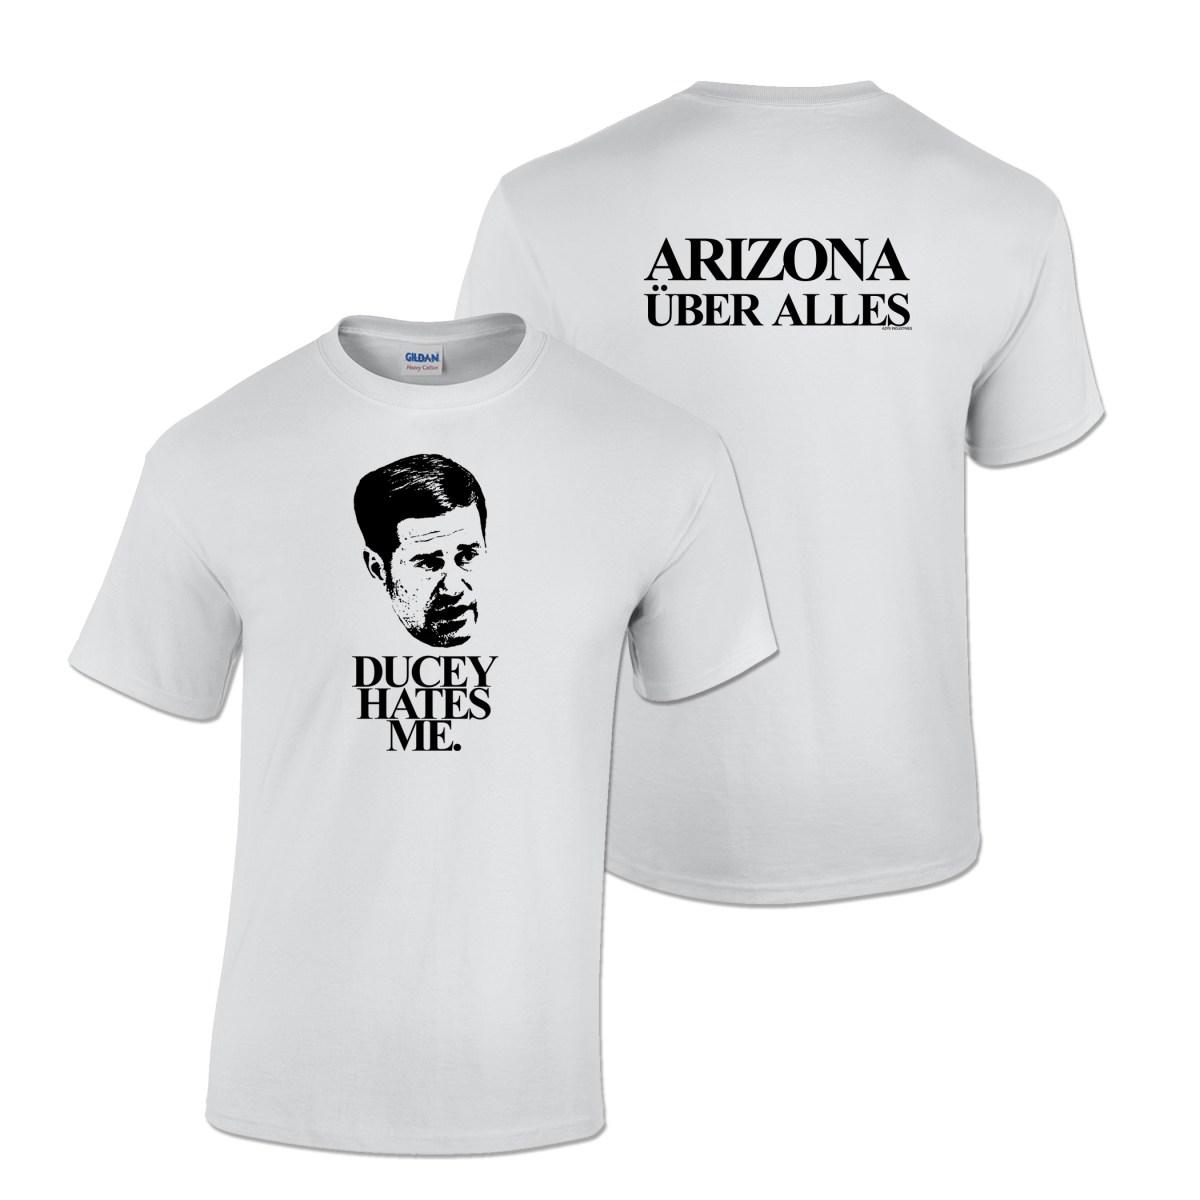 Ducey Hates Me / Arizona Über Alles T-shirt